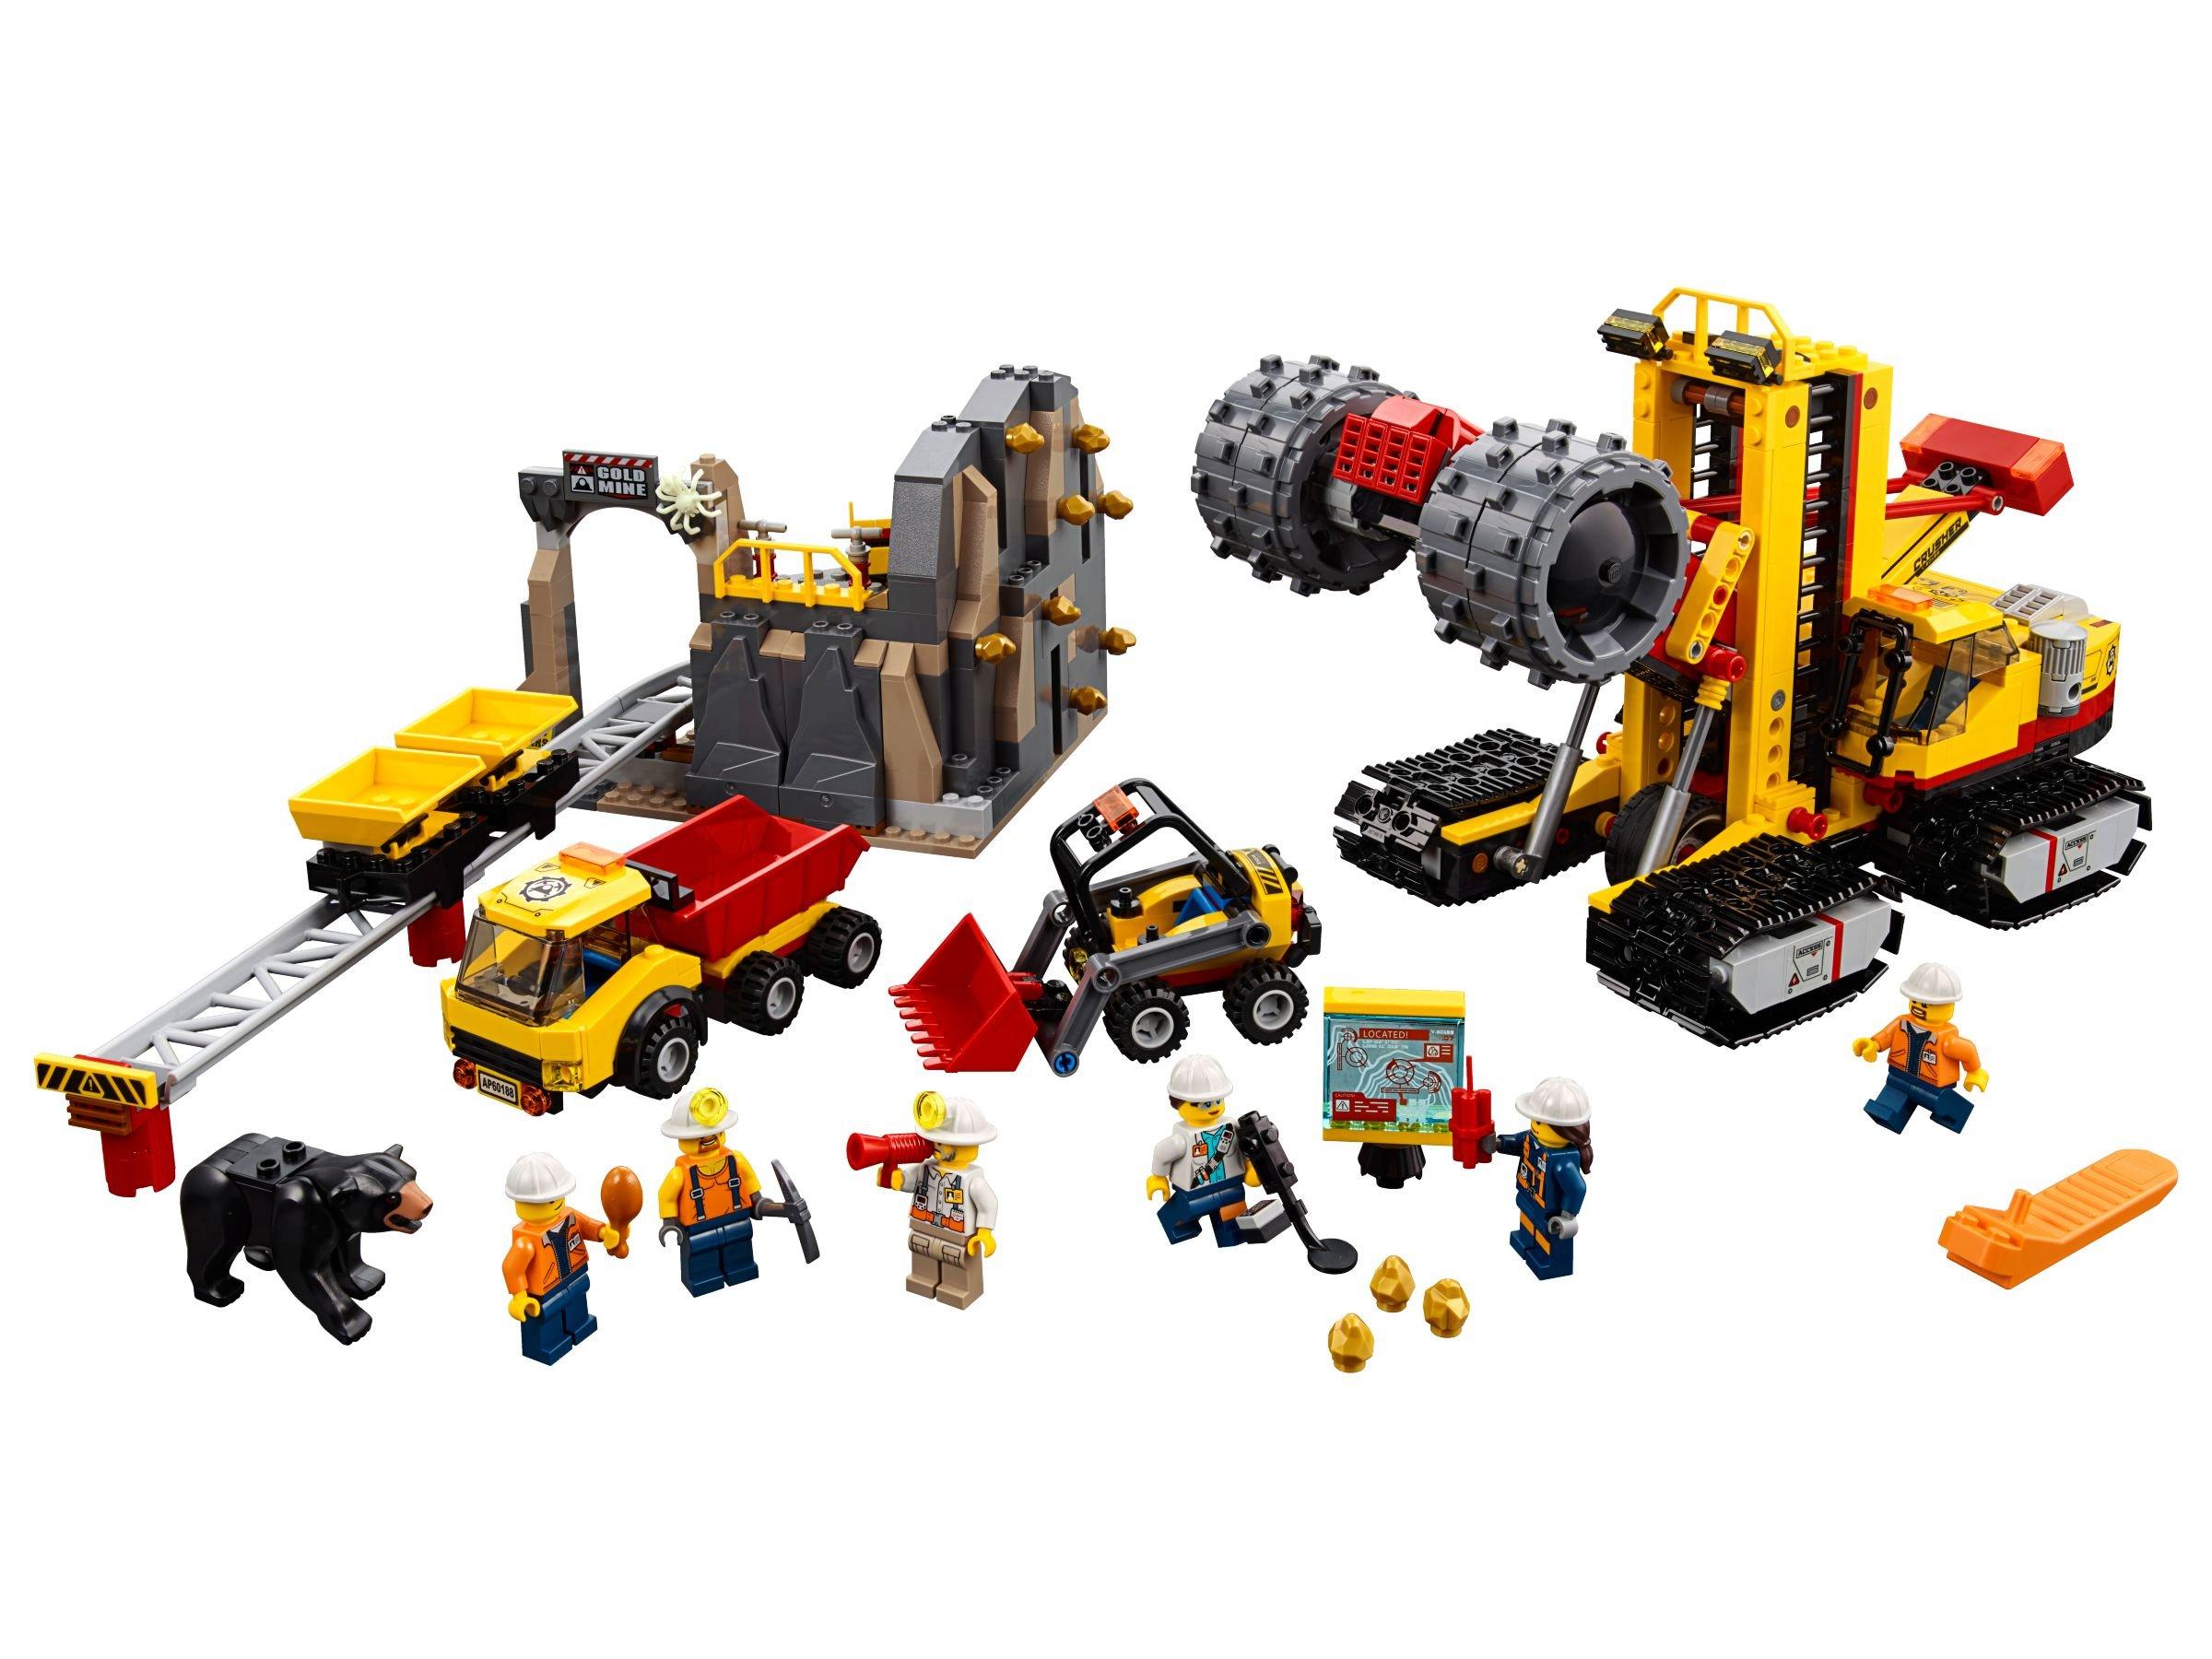 Lego City 60198 Güterzug Ab 13298 30 Gespart Brickmerge